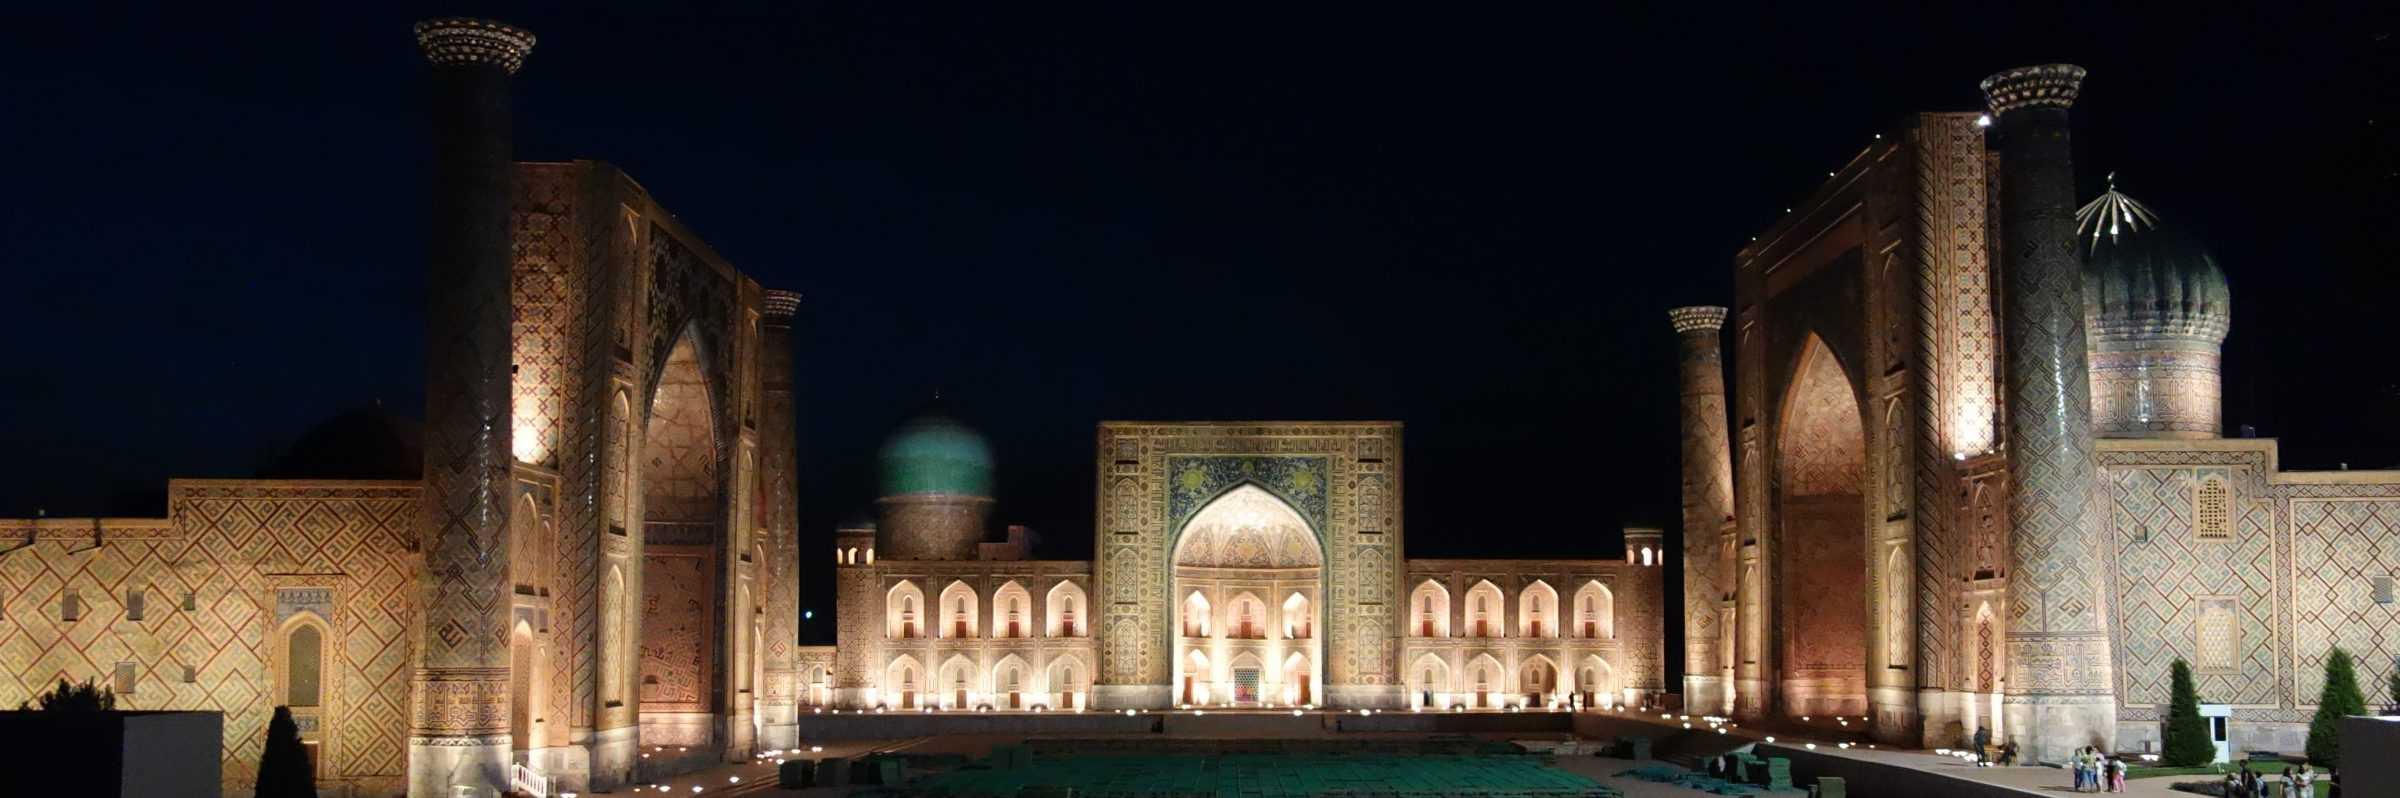 Samarkand Registan by night